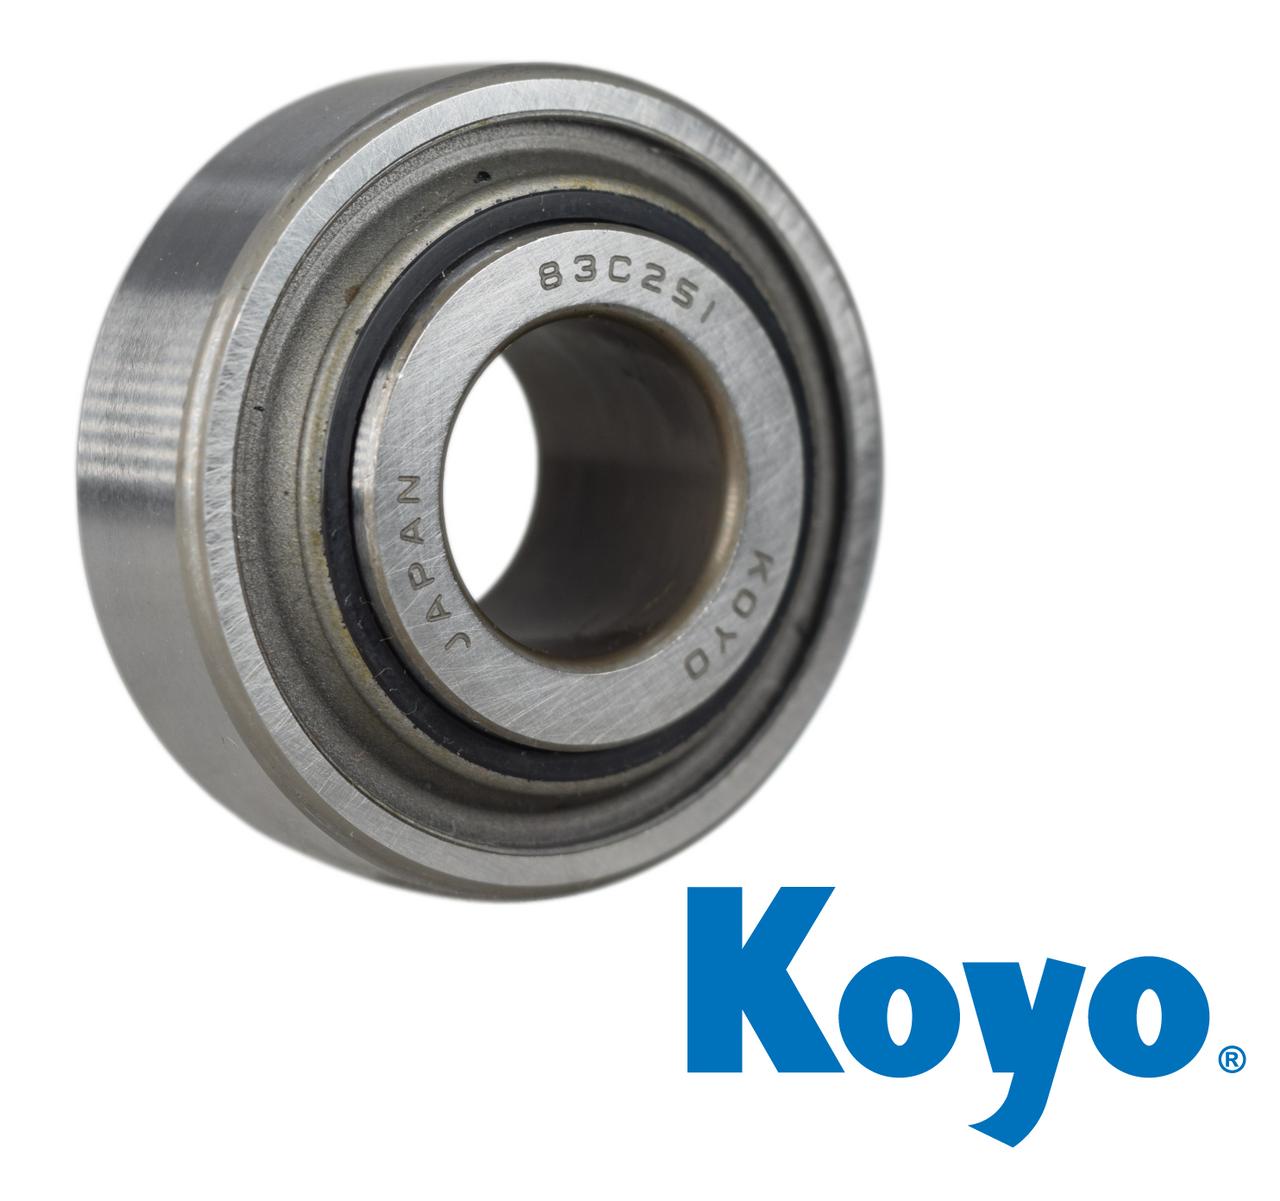 Koyo 83C251 Special Ag Bearing AN142670, AN281357, JD9214, AA82881 Image